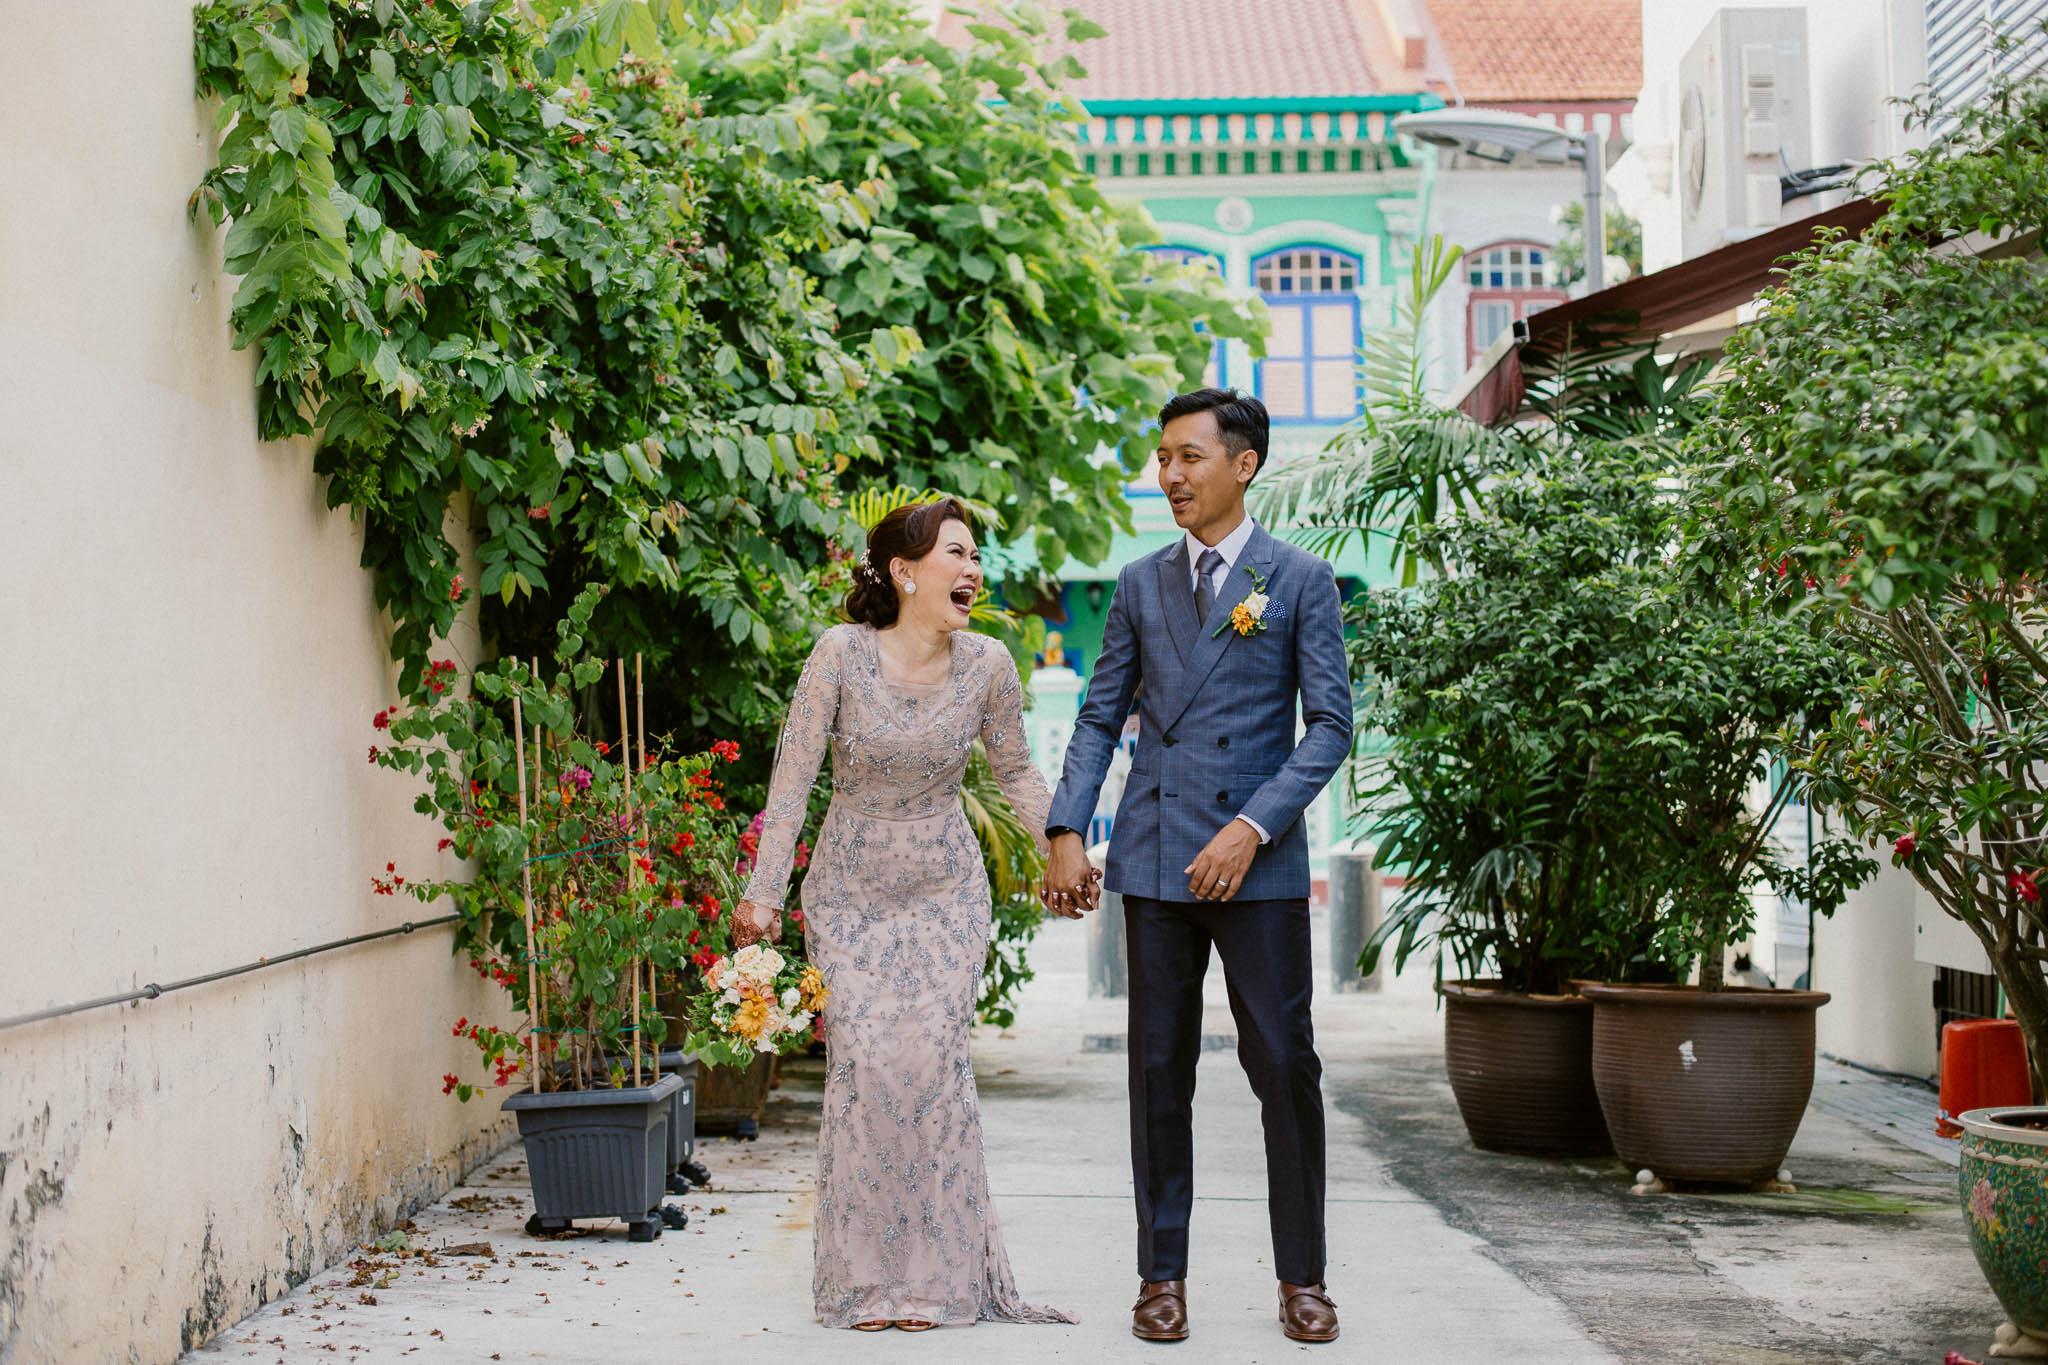 singapore-wedding-photographer-addafiq-nufail-086.jpg